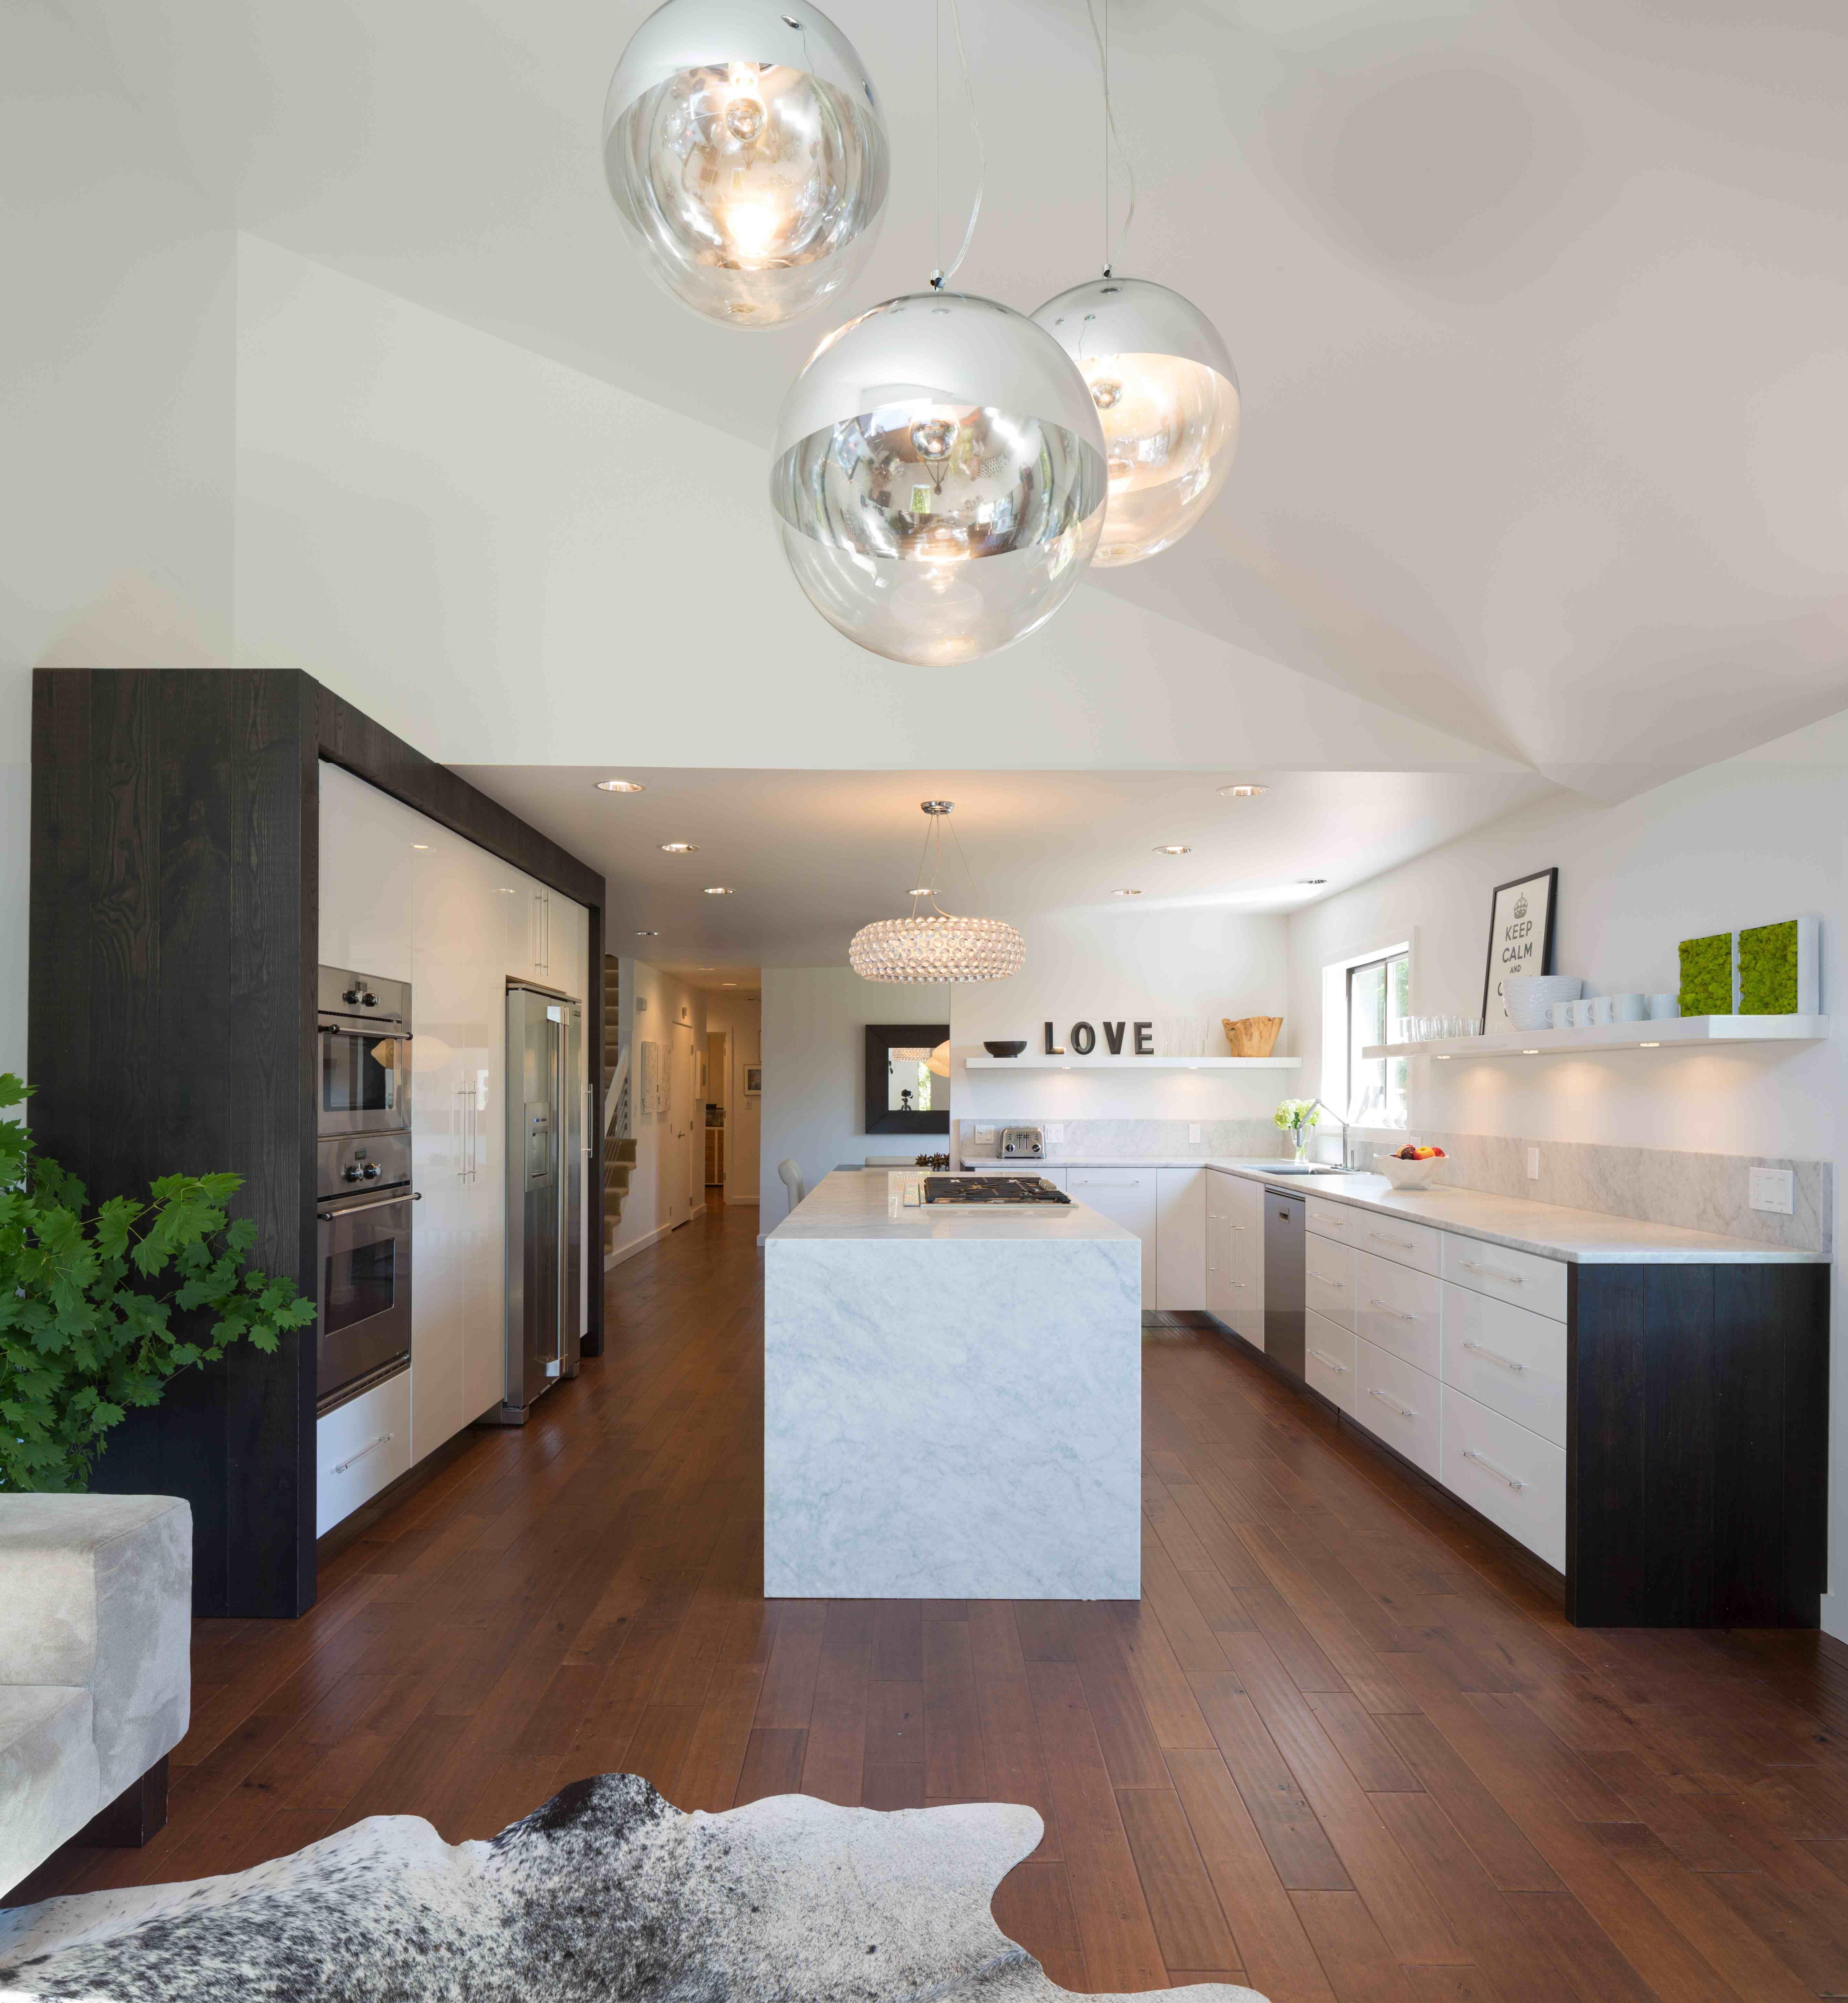 Wood Mode Brookhaven Hardware: Vanillawood Design/build Kitchen. Marble Counters, Dark